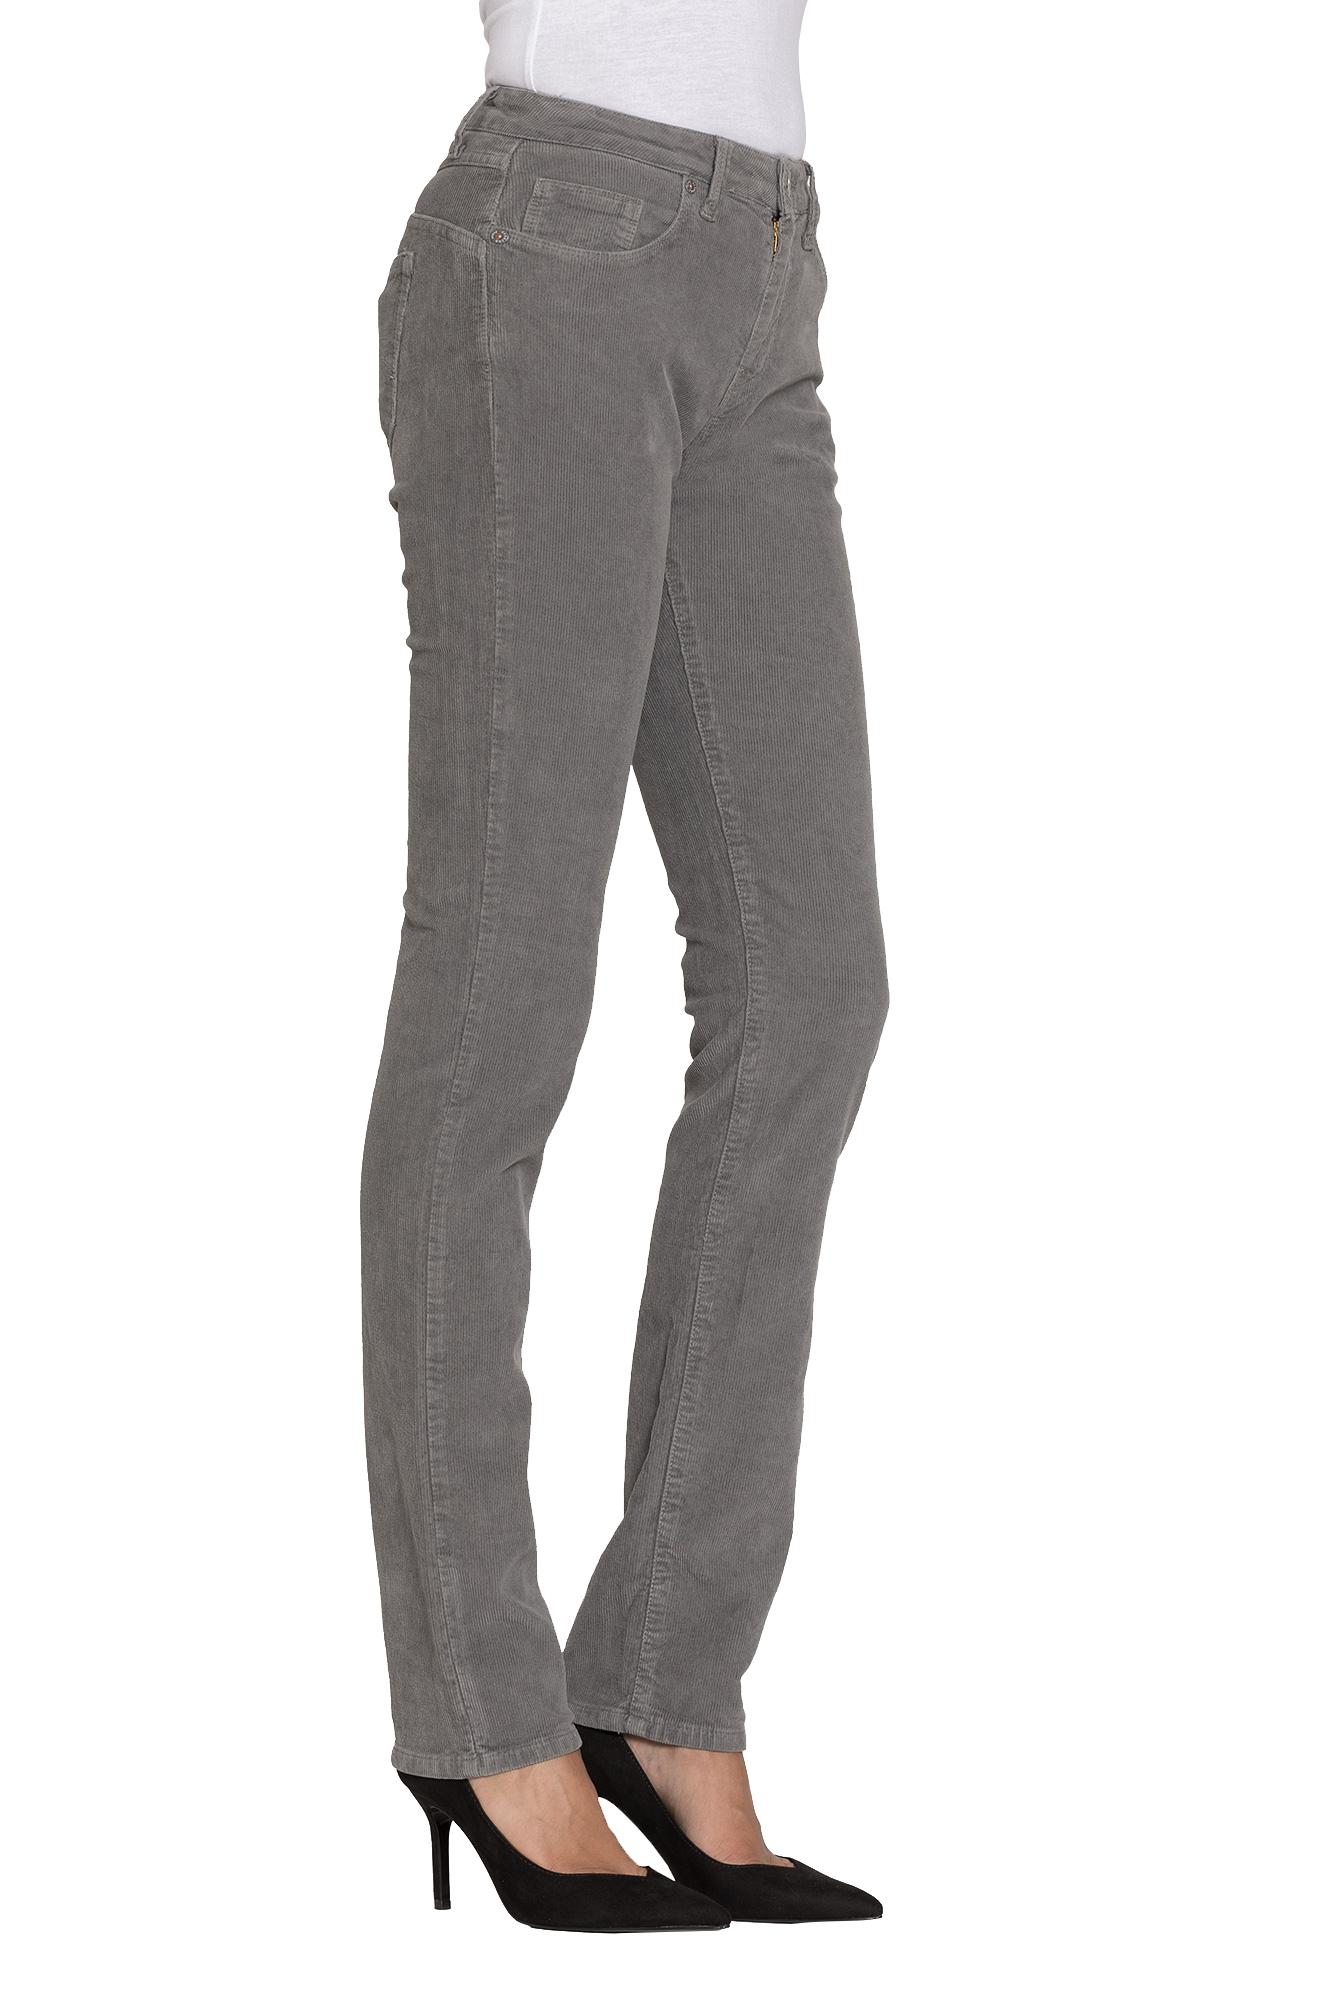 Terciopelo Color Liso Carrera Jeans Pantalones Para Mujer Pantalones